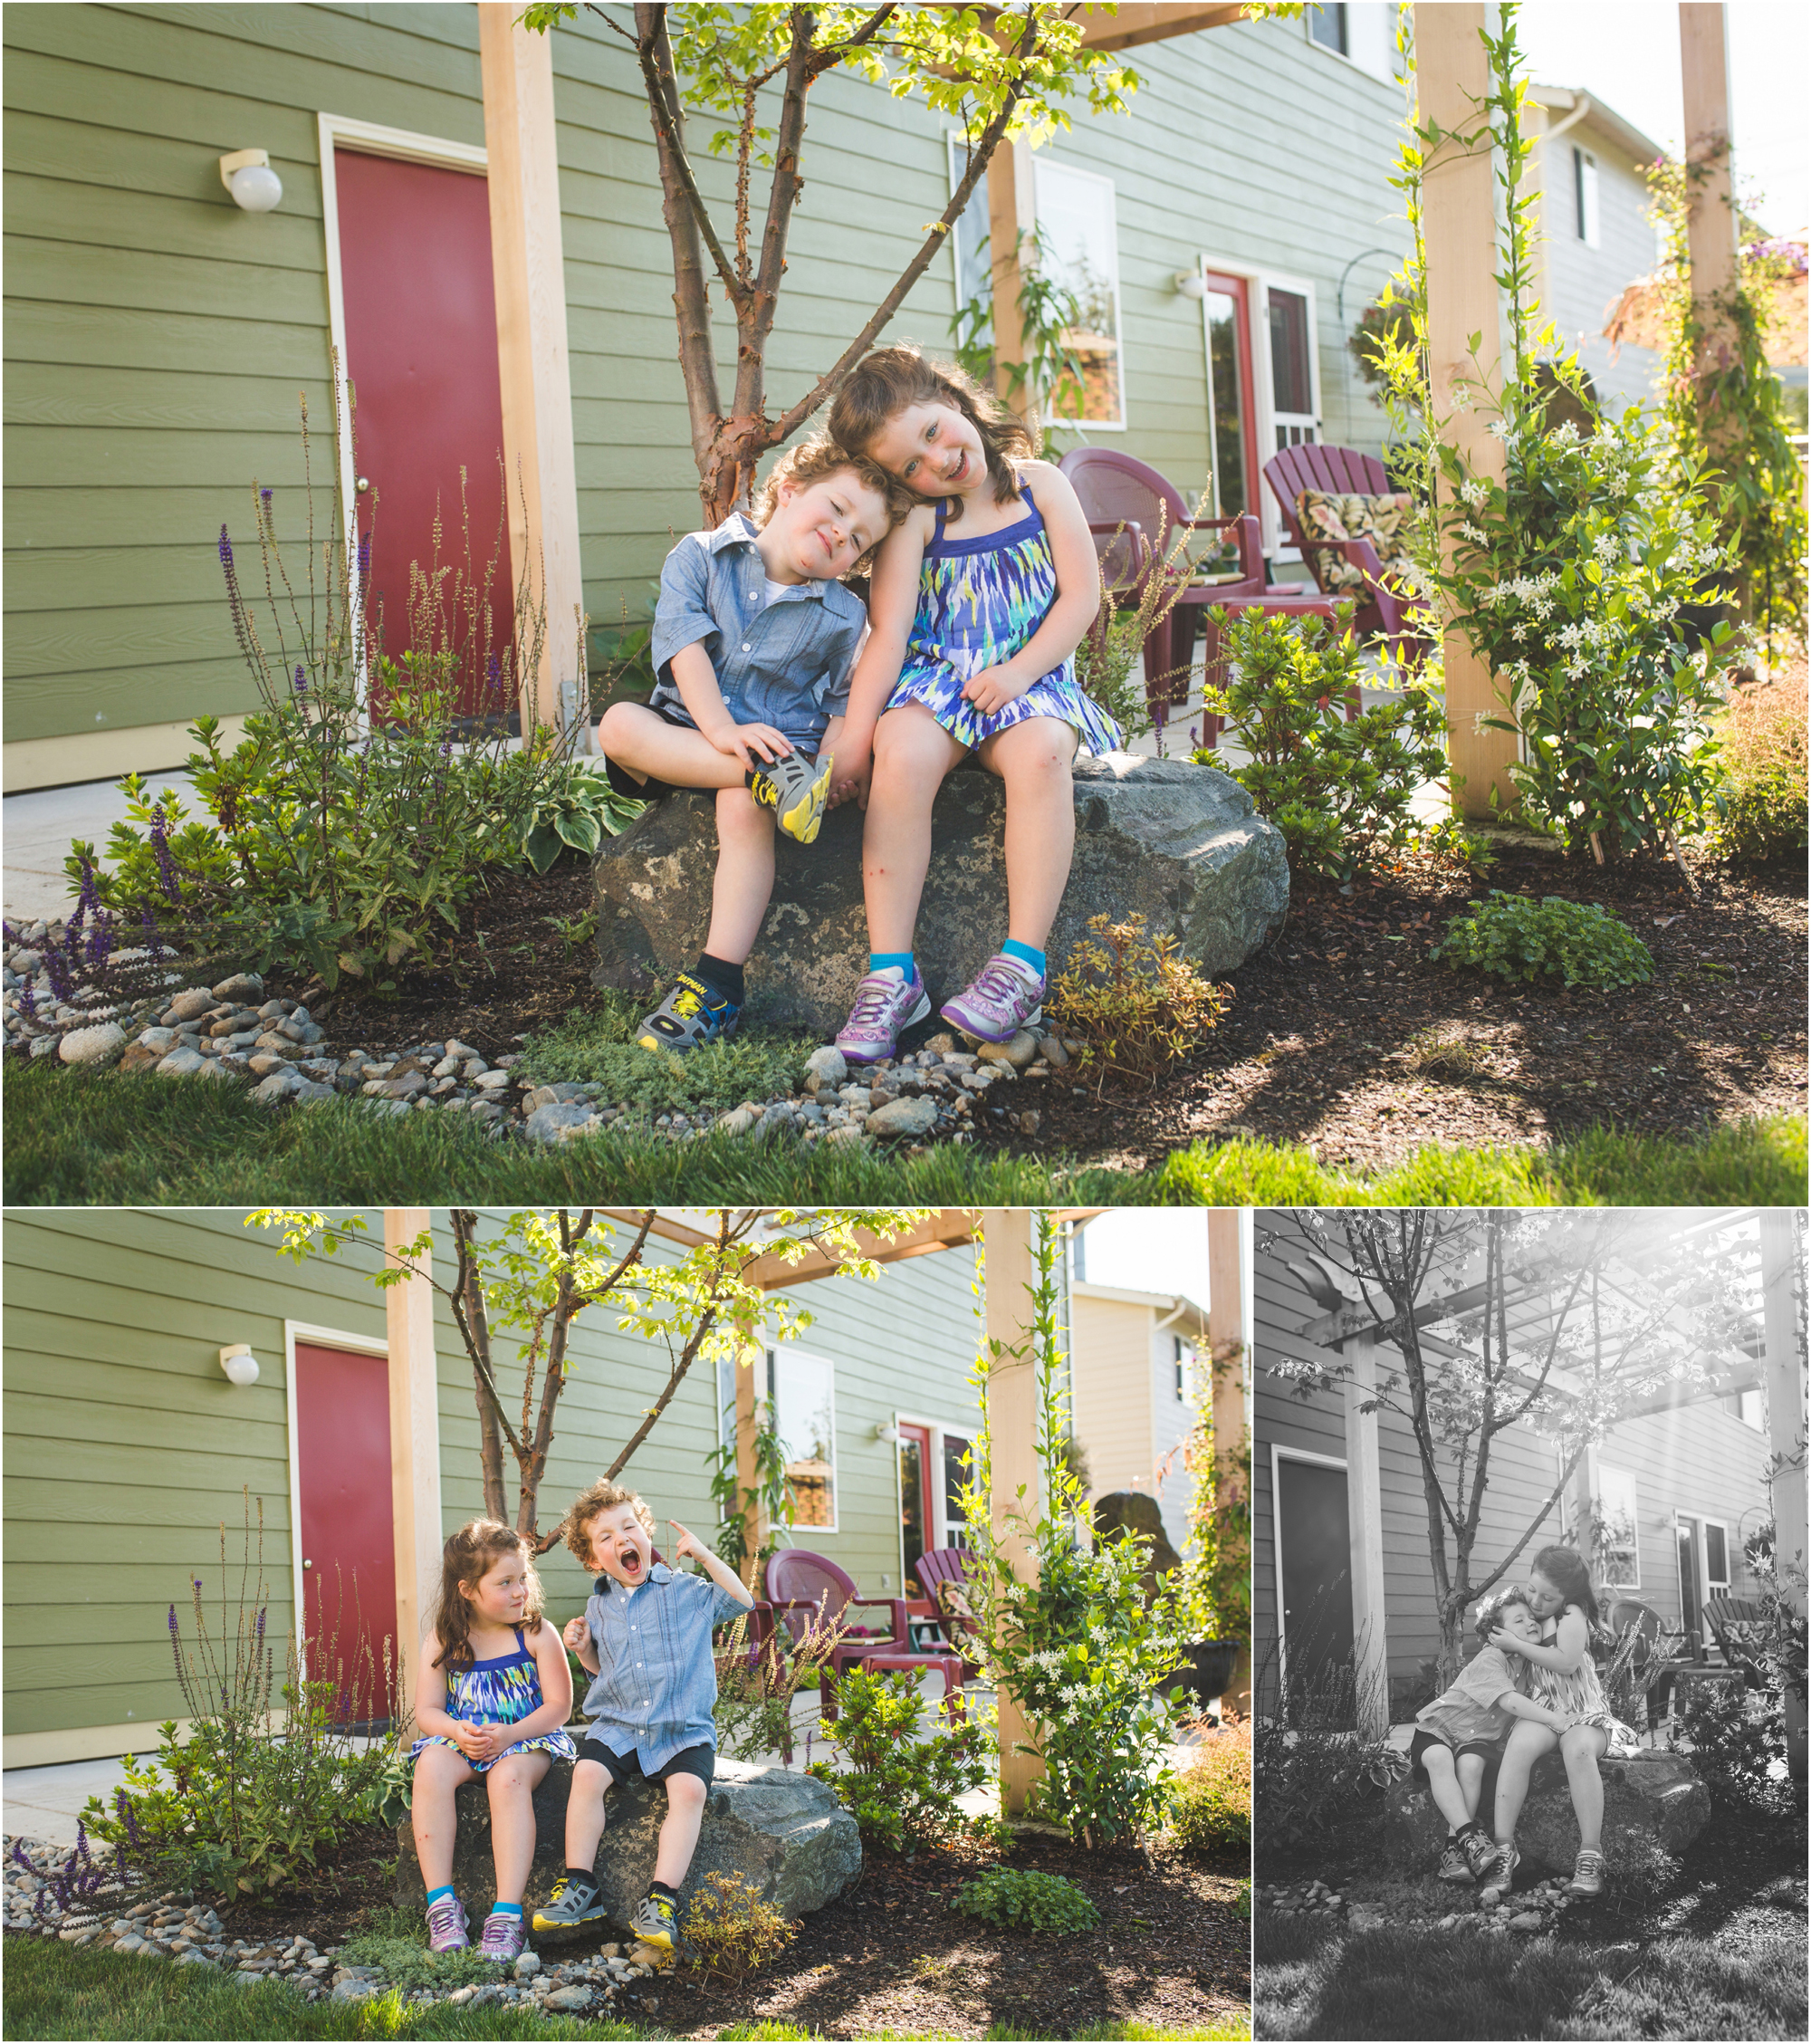 ashley vos photography seattle tacoma area family photographer_0602.jpg